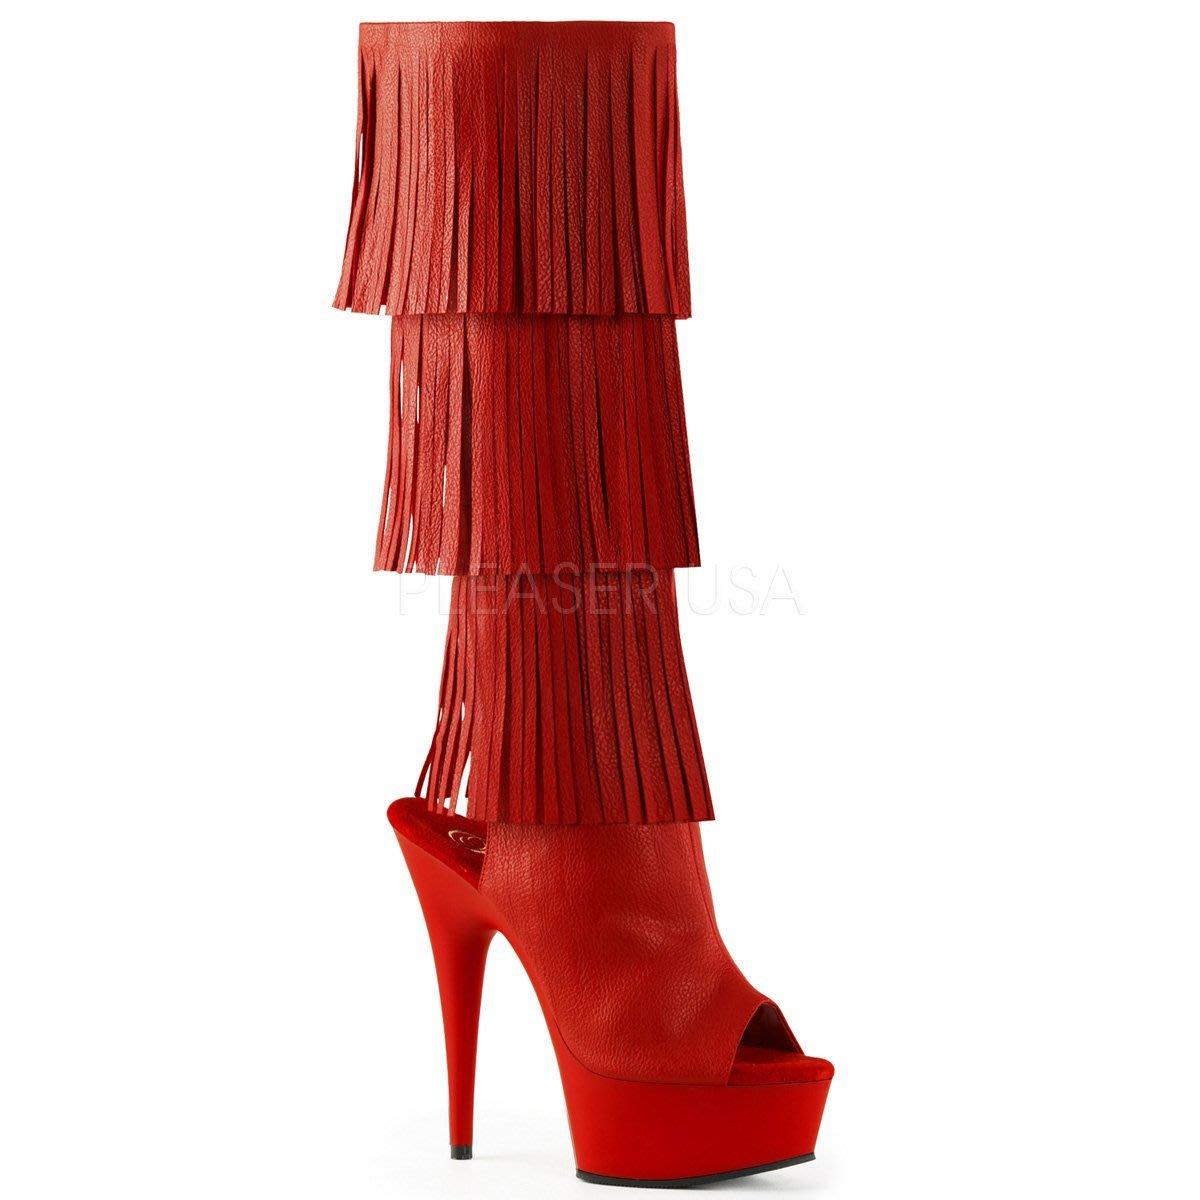 Shoes InStyle《六吋》美國品牌 PLEASER 原廠正品流蘇厚底高跟魚口及膝中長筒馬靴 出清『紅色』